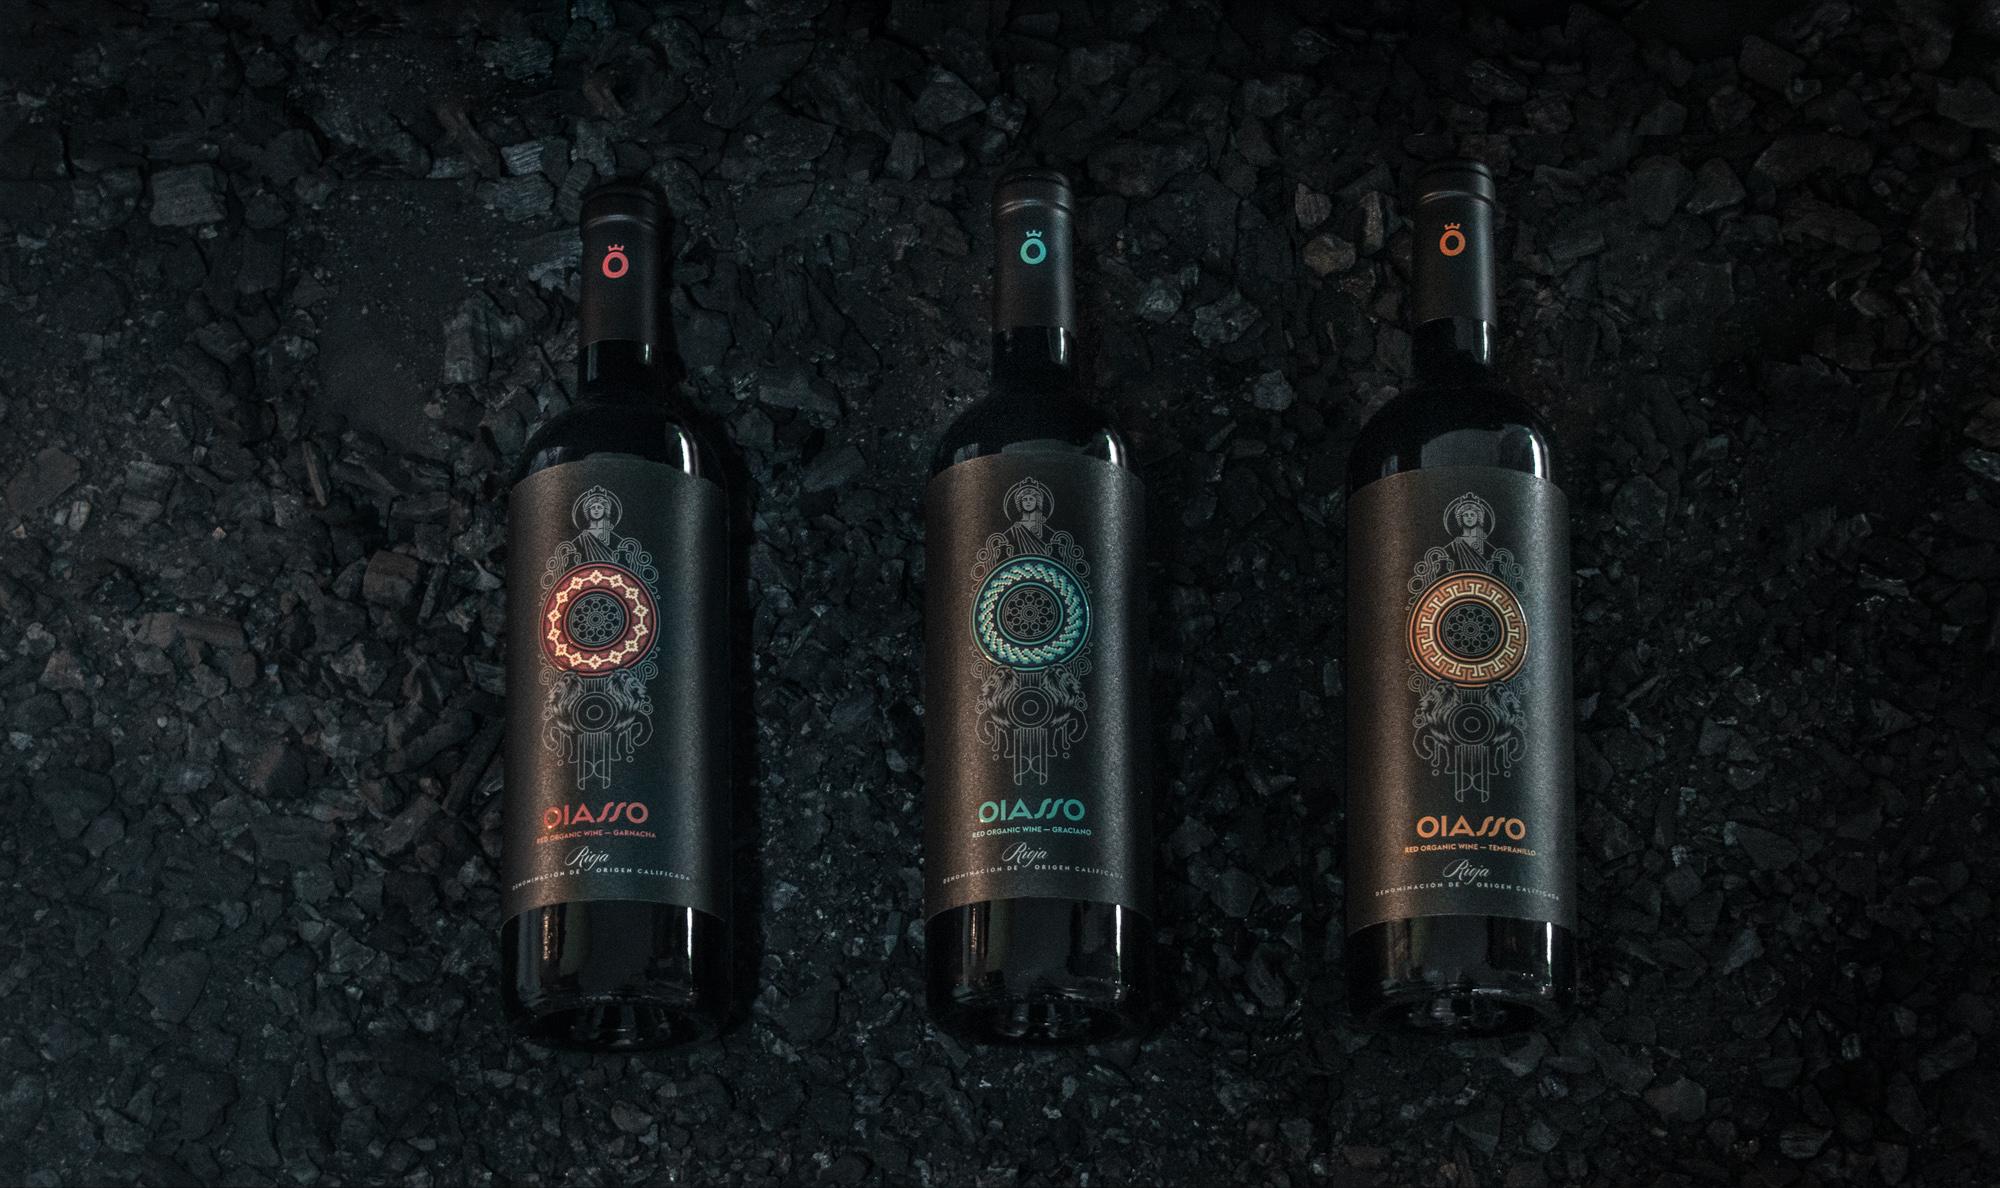 Oiasso, Bagordi, branding, packaging, vino, papelería